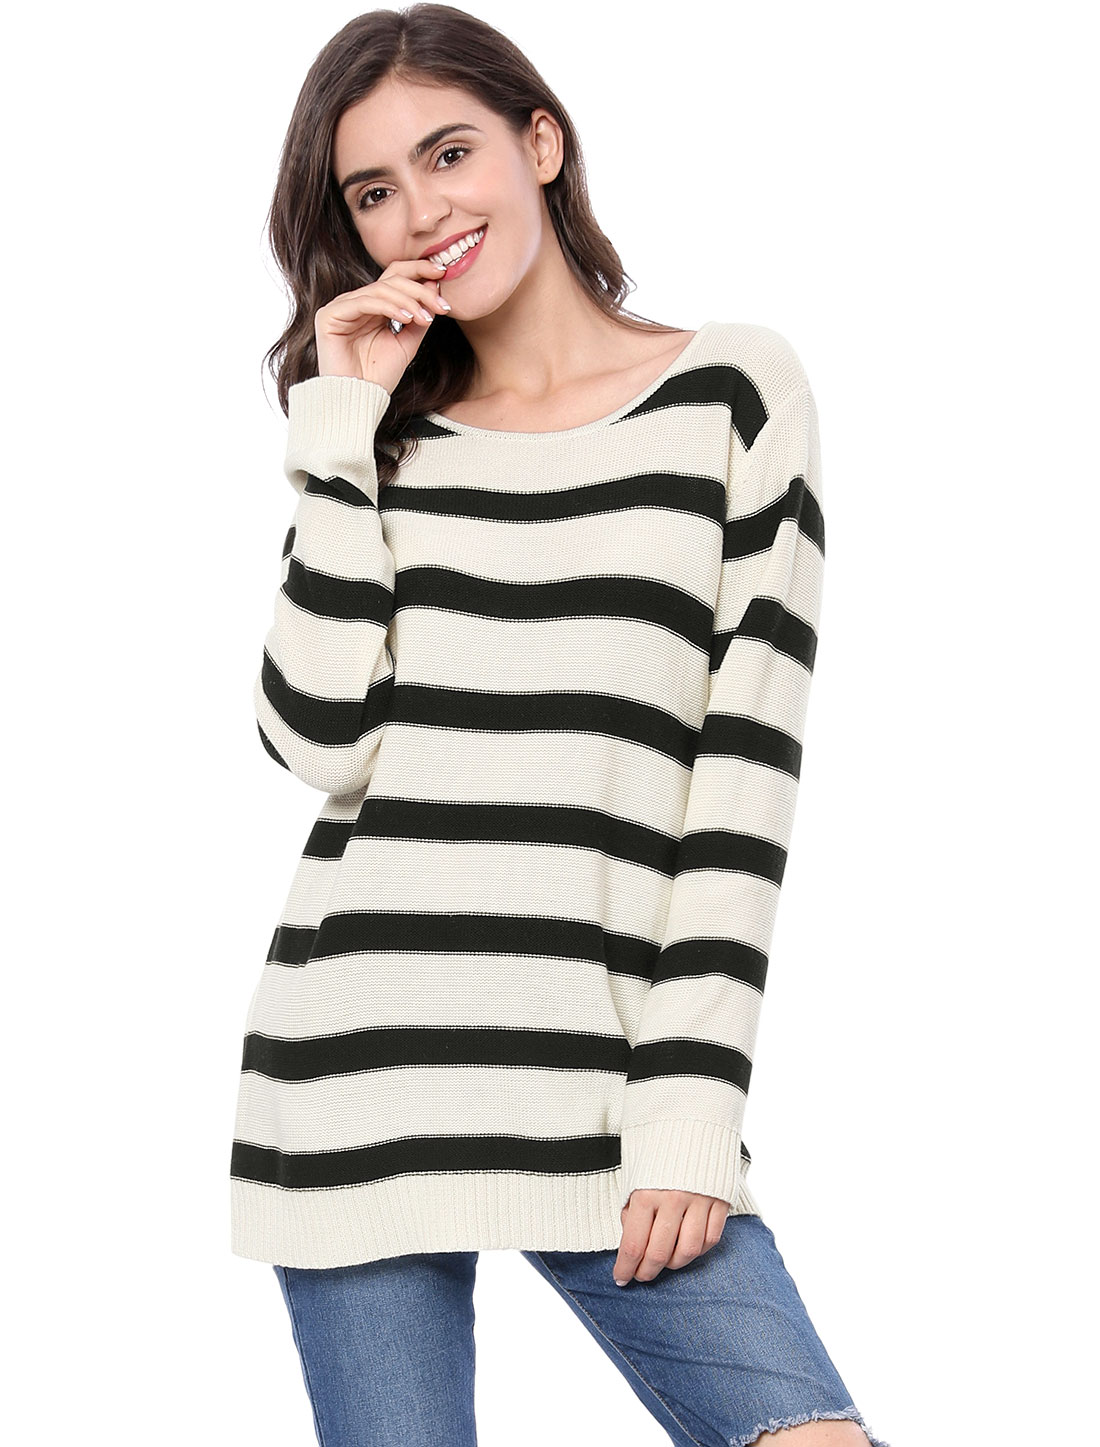 Allegra K Women Long Sleeves Drop Shoulder Loose Striped Sweater White L